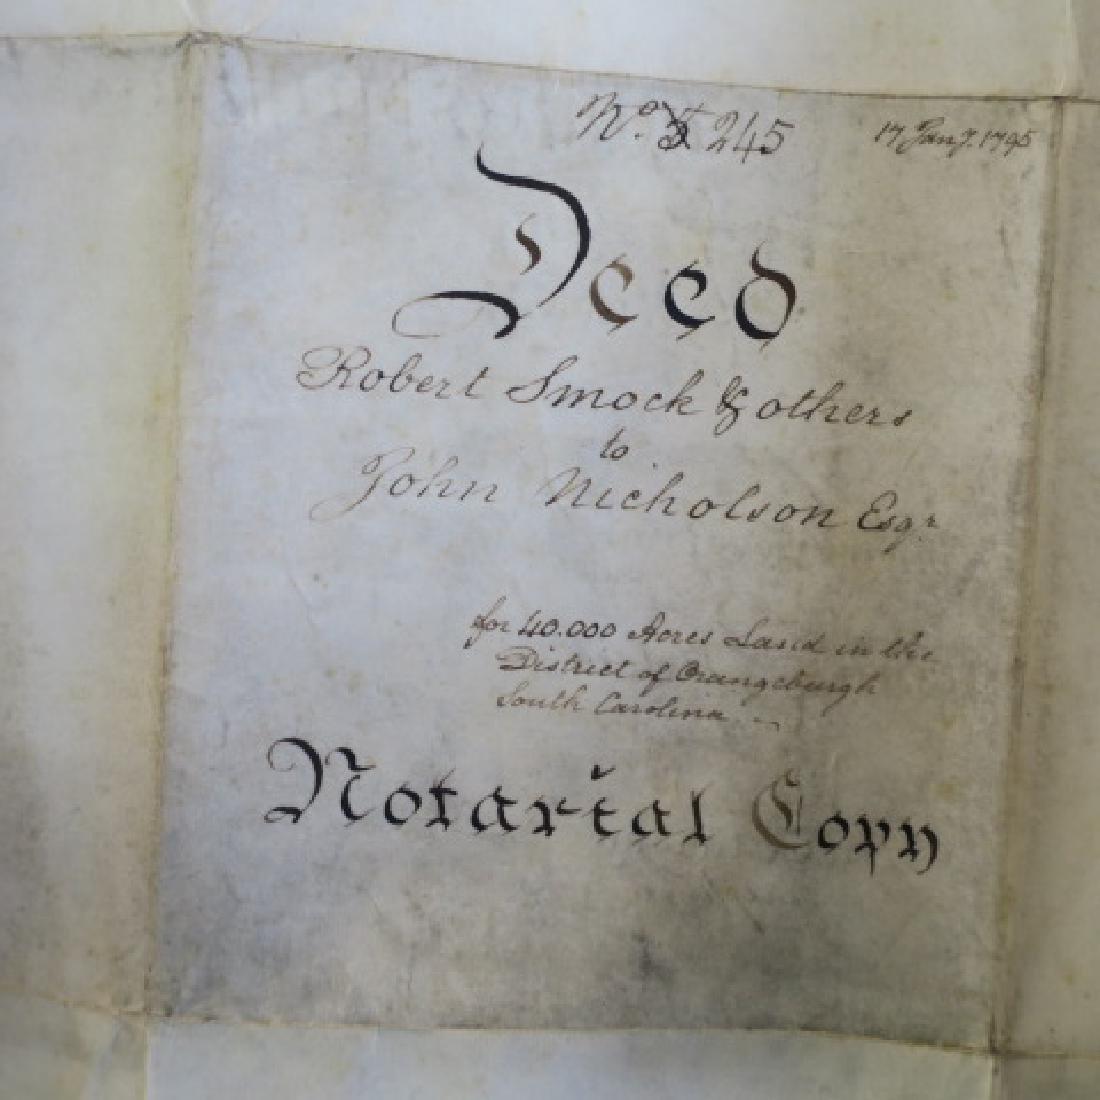 PENNSYLVANIA LAND GRANT, JOHN NICHOLSON, 1795: - 6